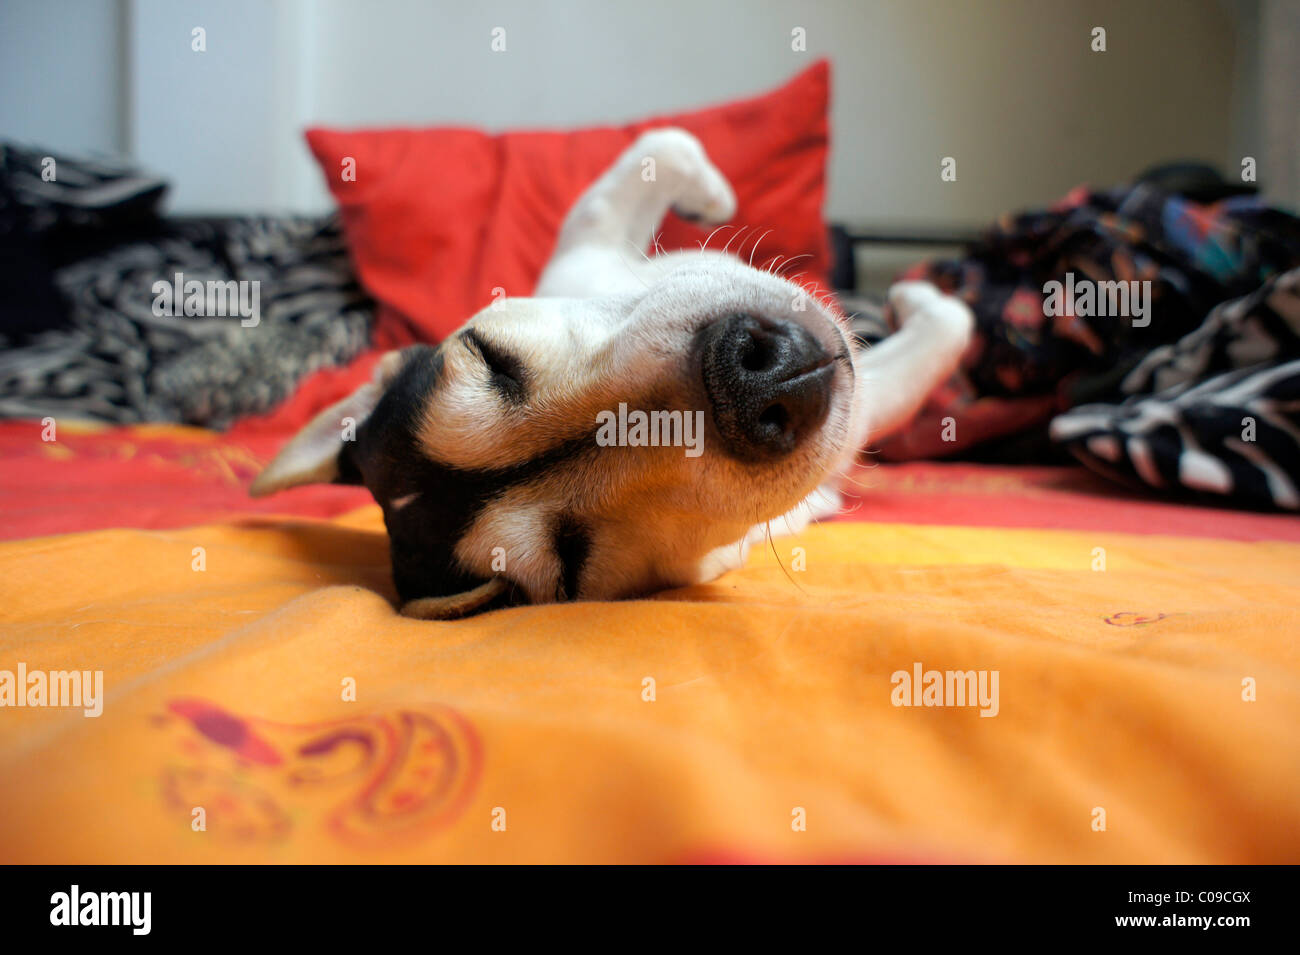 Sleeping Jack Russell - Stock Image